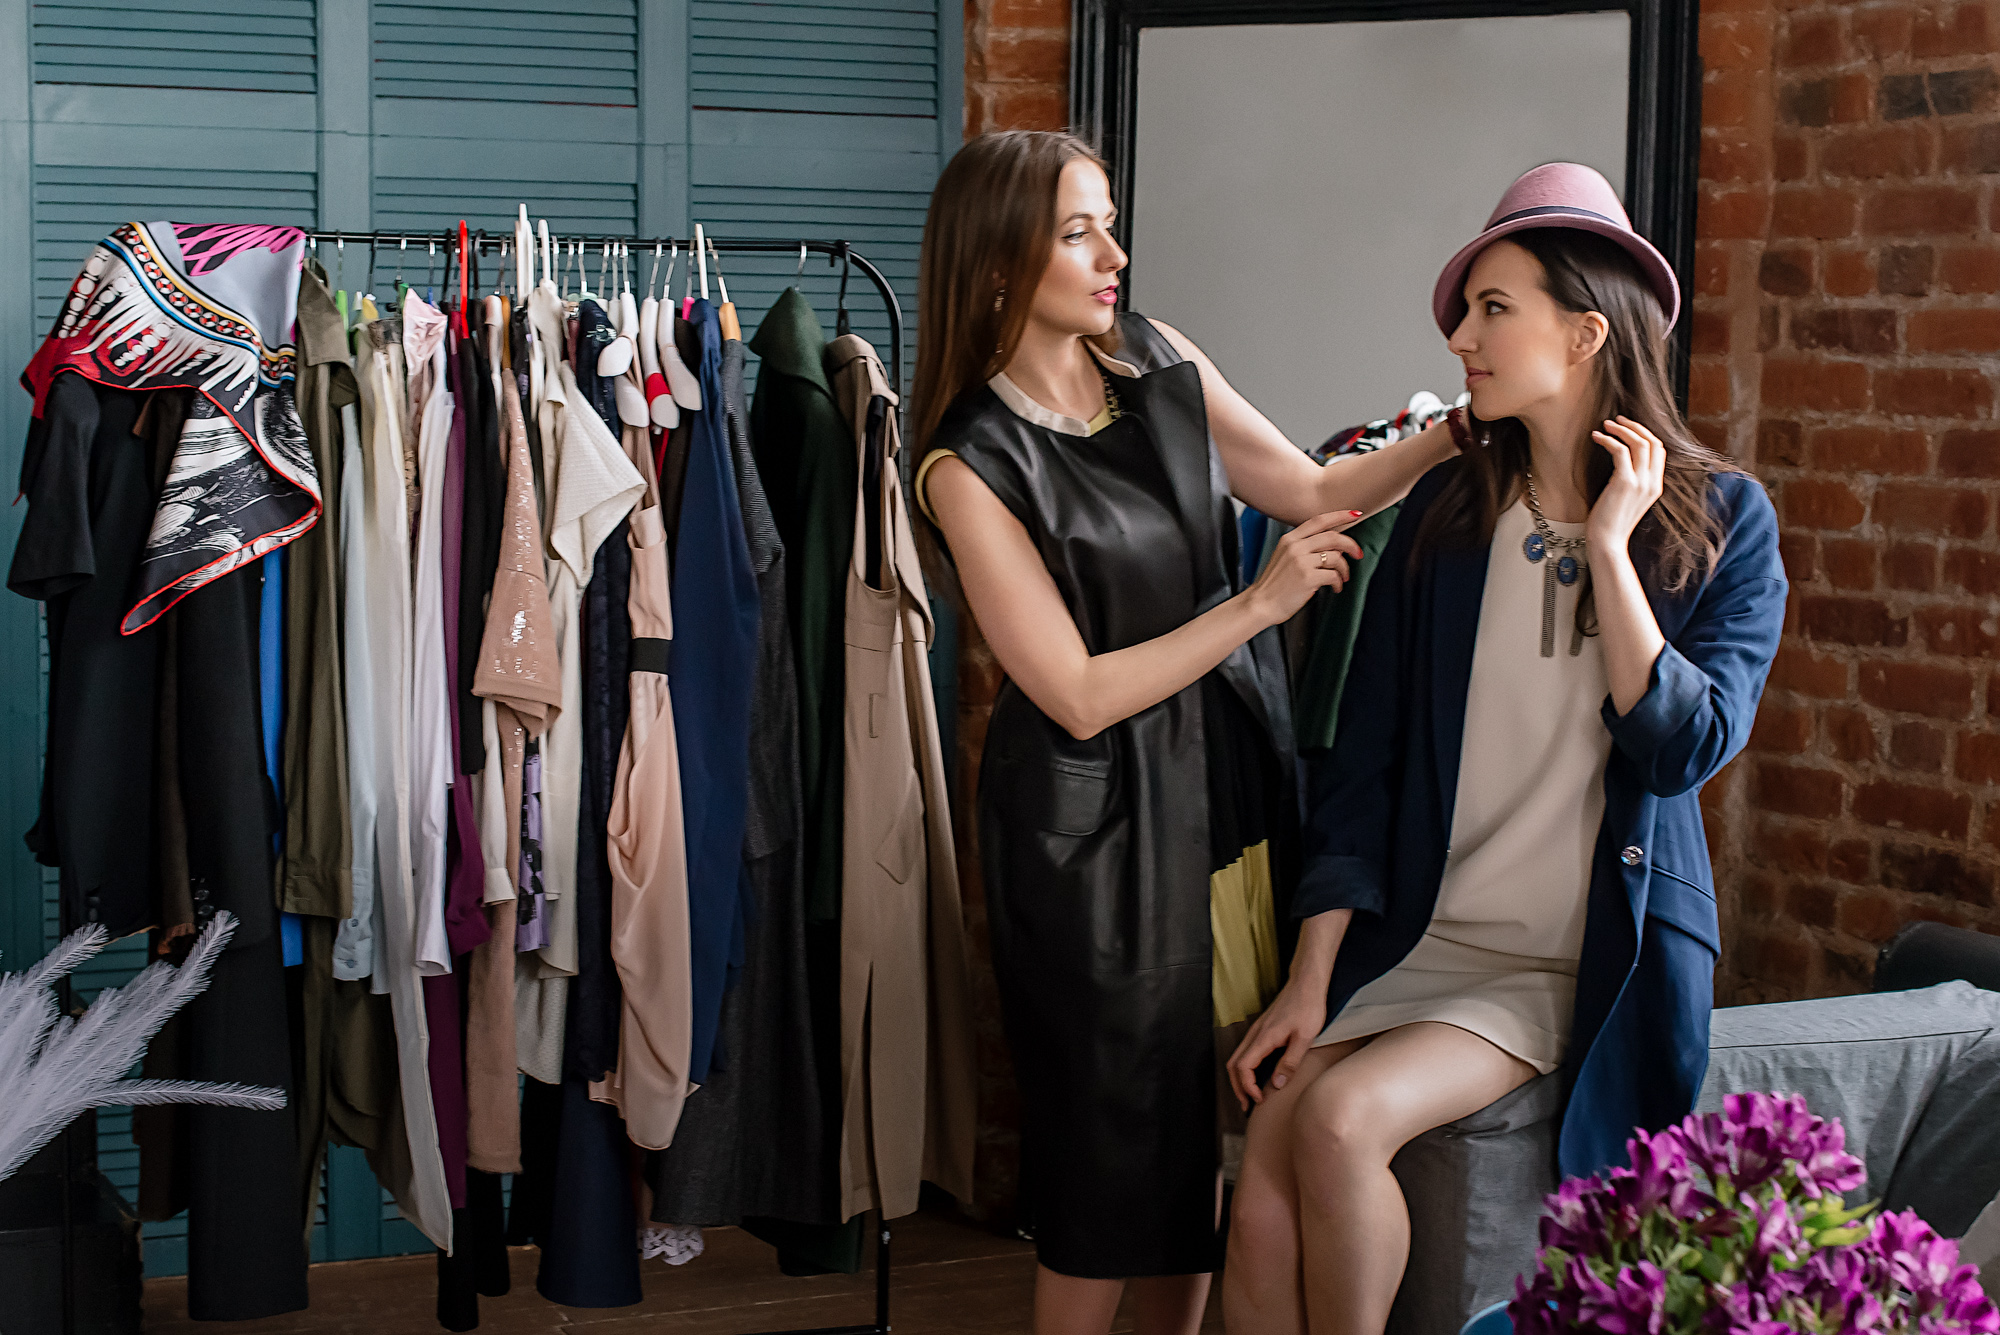 Мода XXI века: просто, но со вкусом